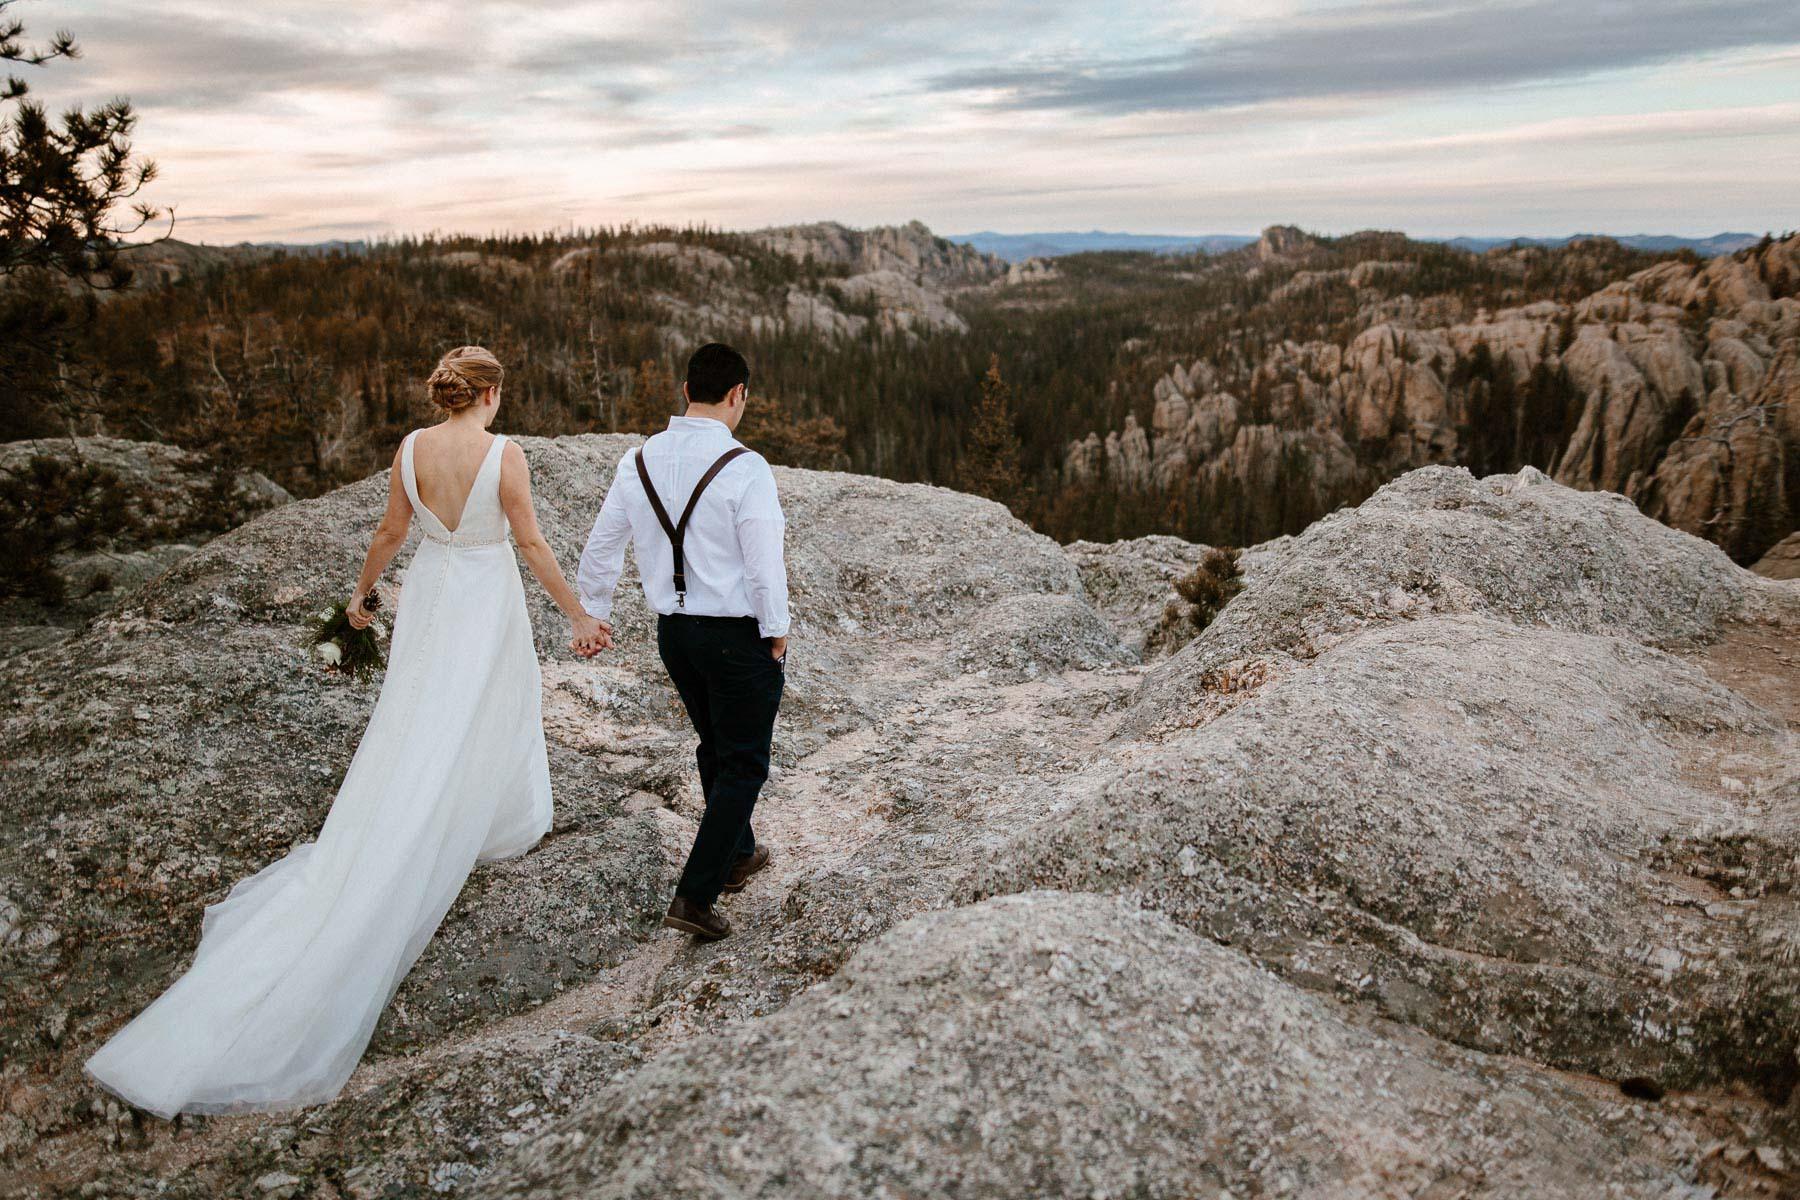 sioux-falls-black-hills-rapid-city-elopement-wedding-adventure-photographer-custer-sylvan-lake-42.jpg